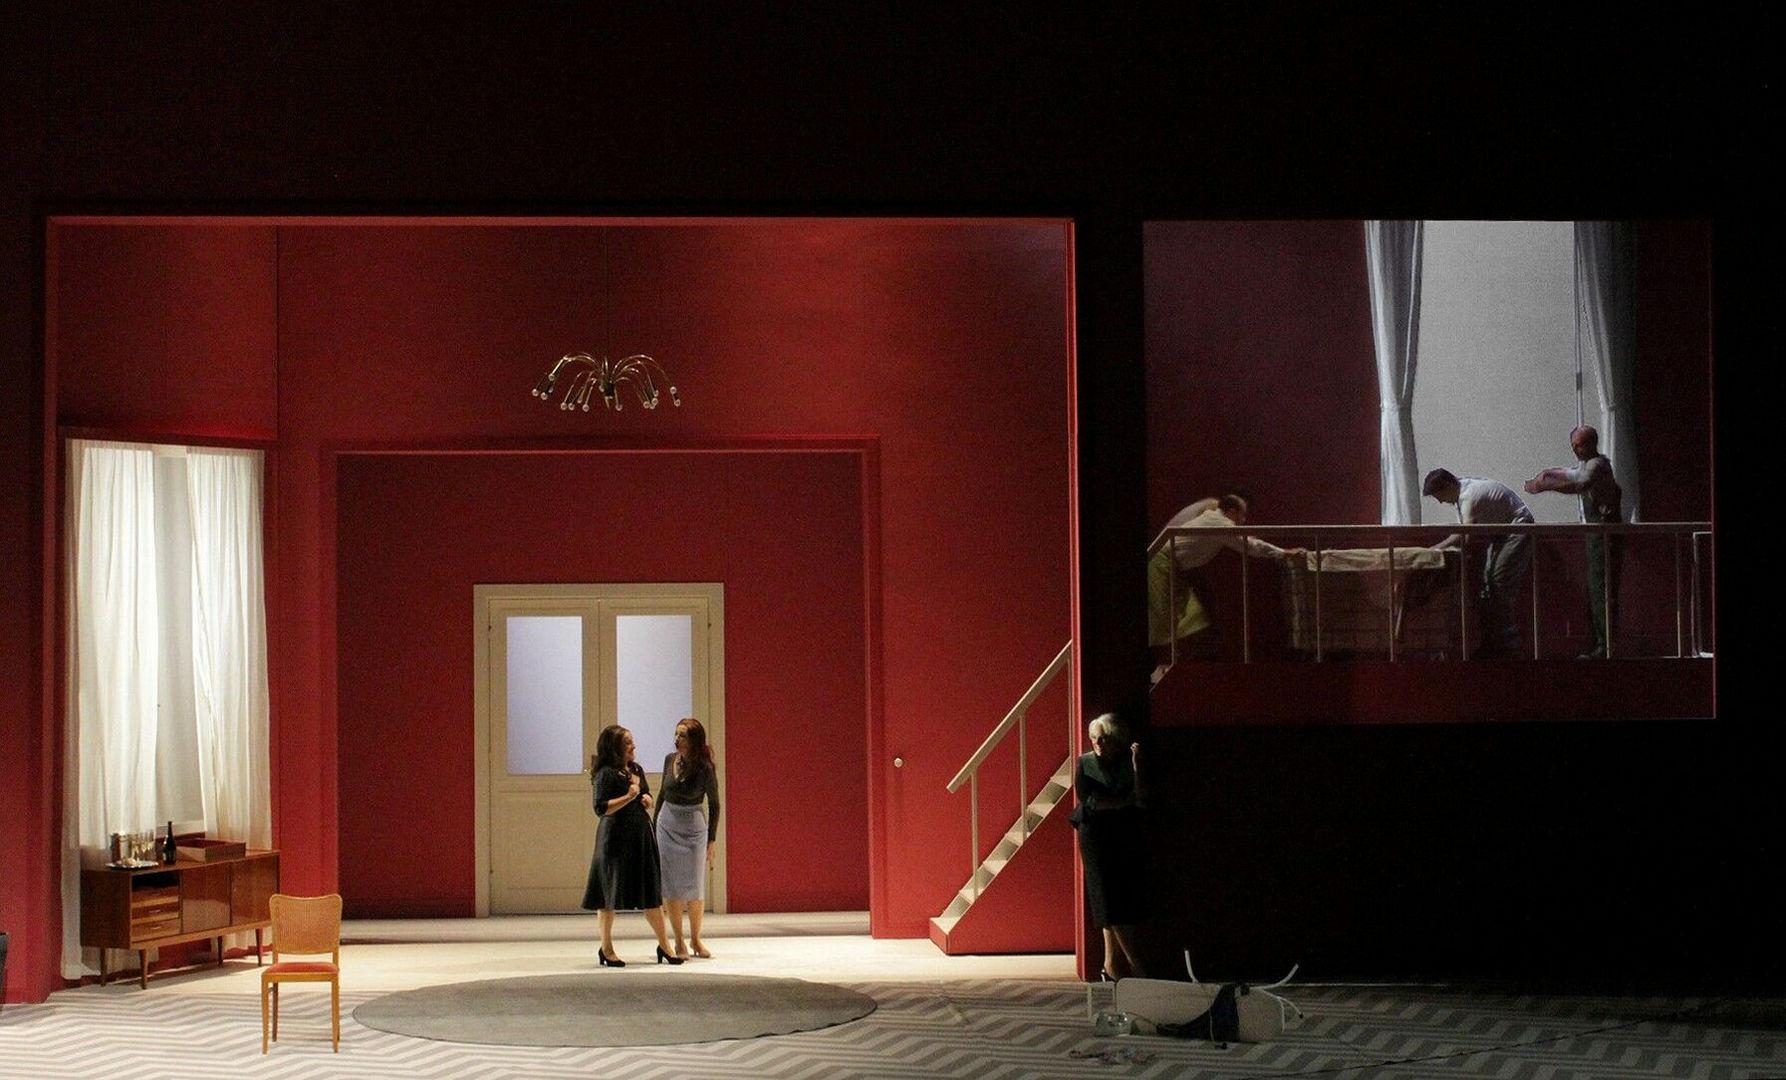 Falstaff-Opera-by-Giuseppe-Verdi-directed-by-Jacopo-Spirei- in-Karlsruhe-8